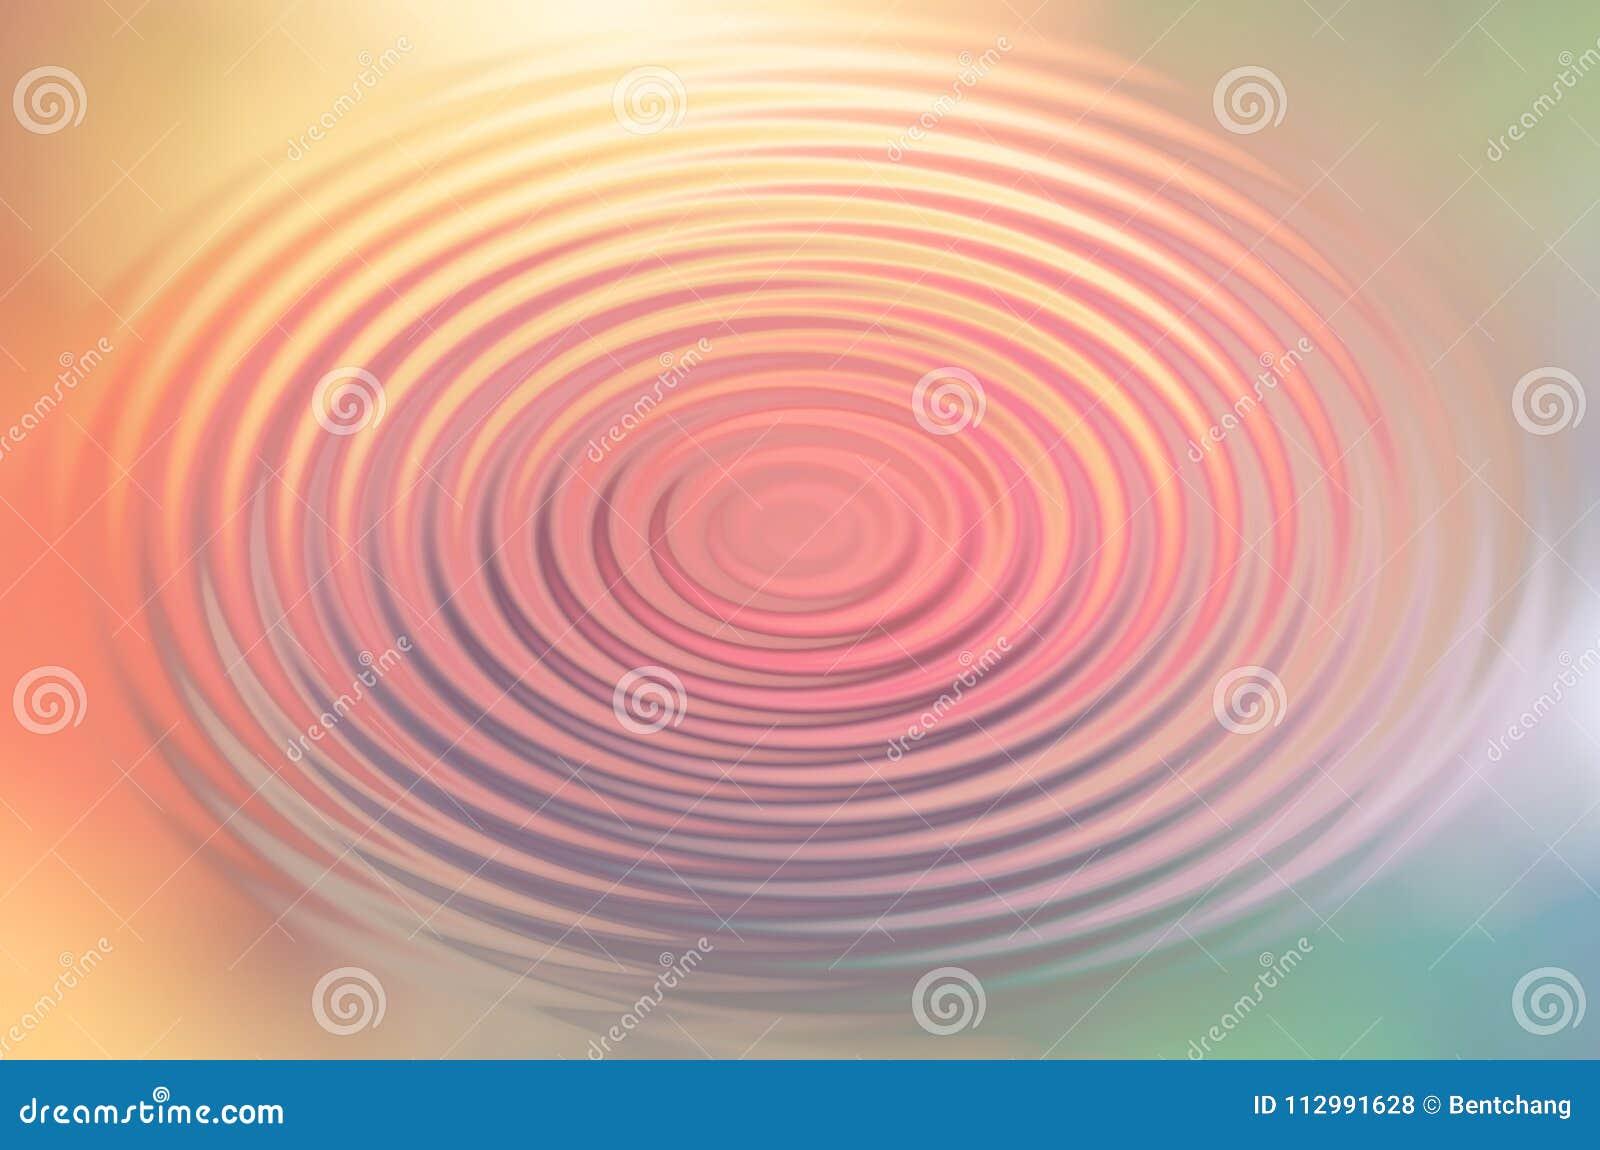 Abstract motion illustrations background. Blur, distort, ripple, beauty & design.